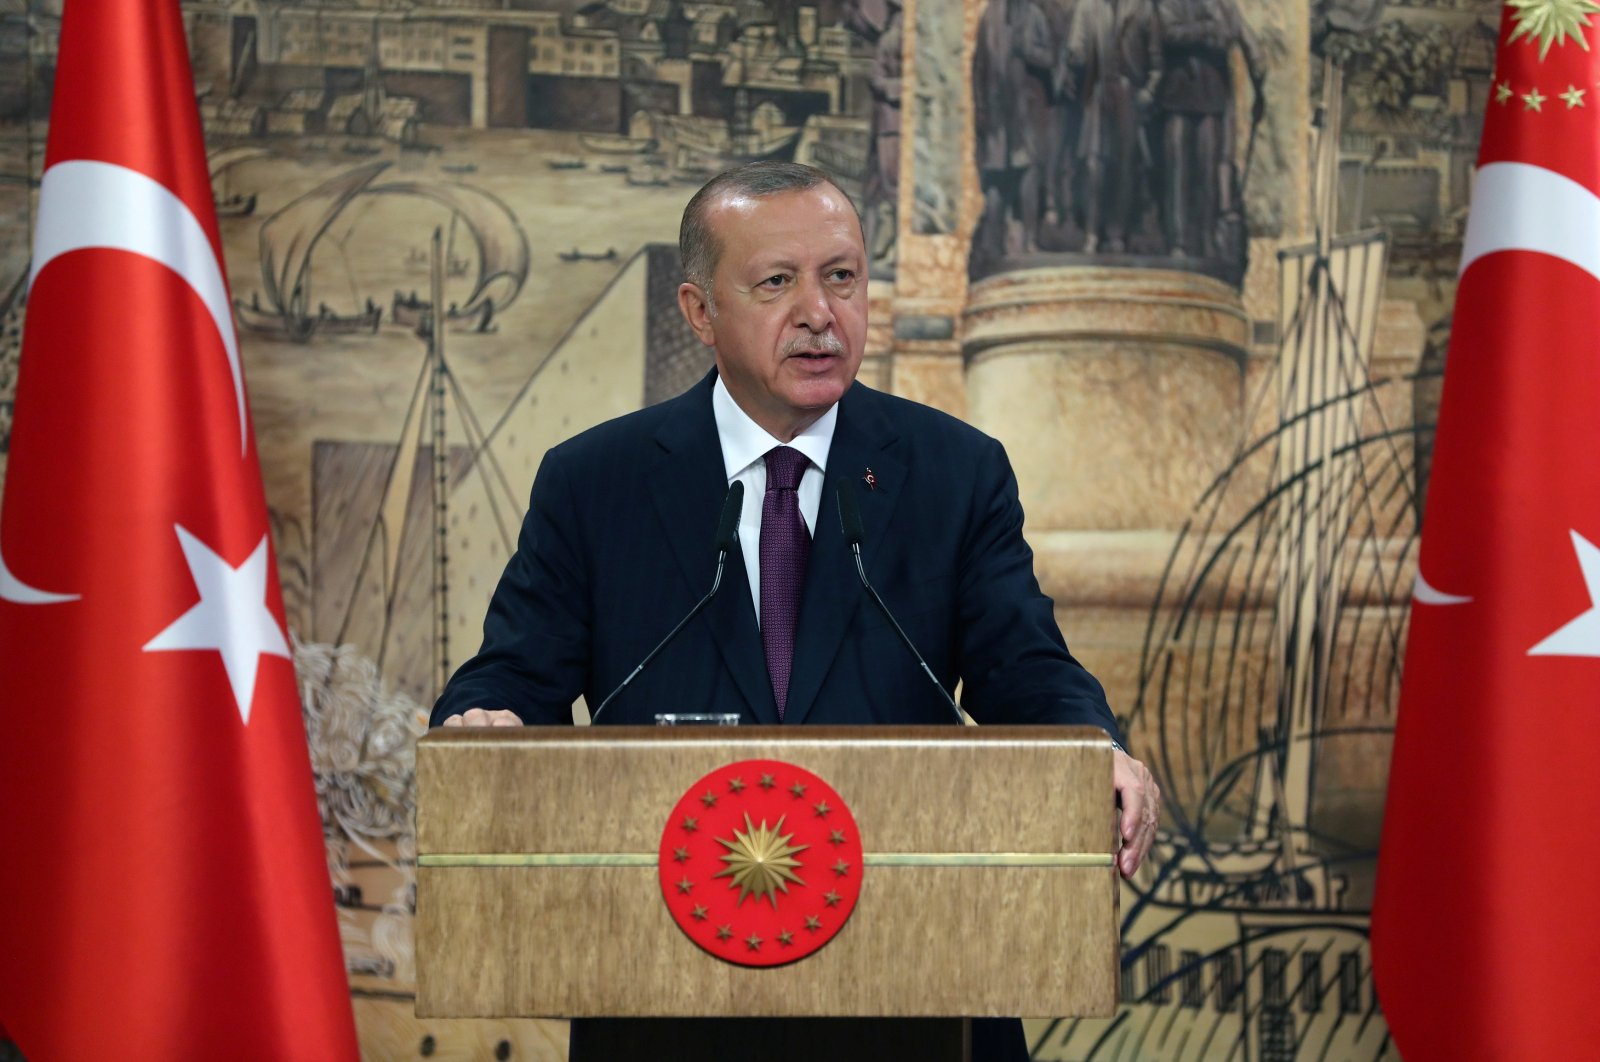 Turkey's President Tayyip Erdoğan addresses the nation in Istanbul, Turkey, August 21, 2020. (Reuters Photo)